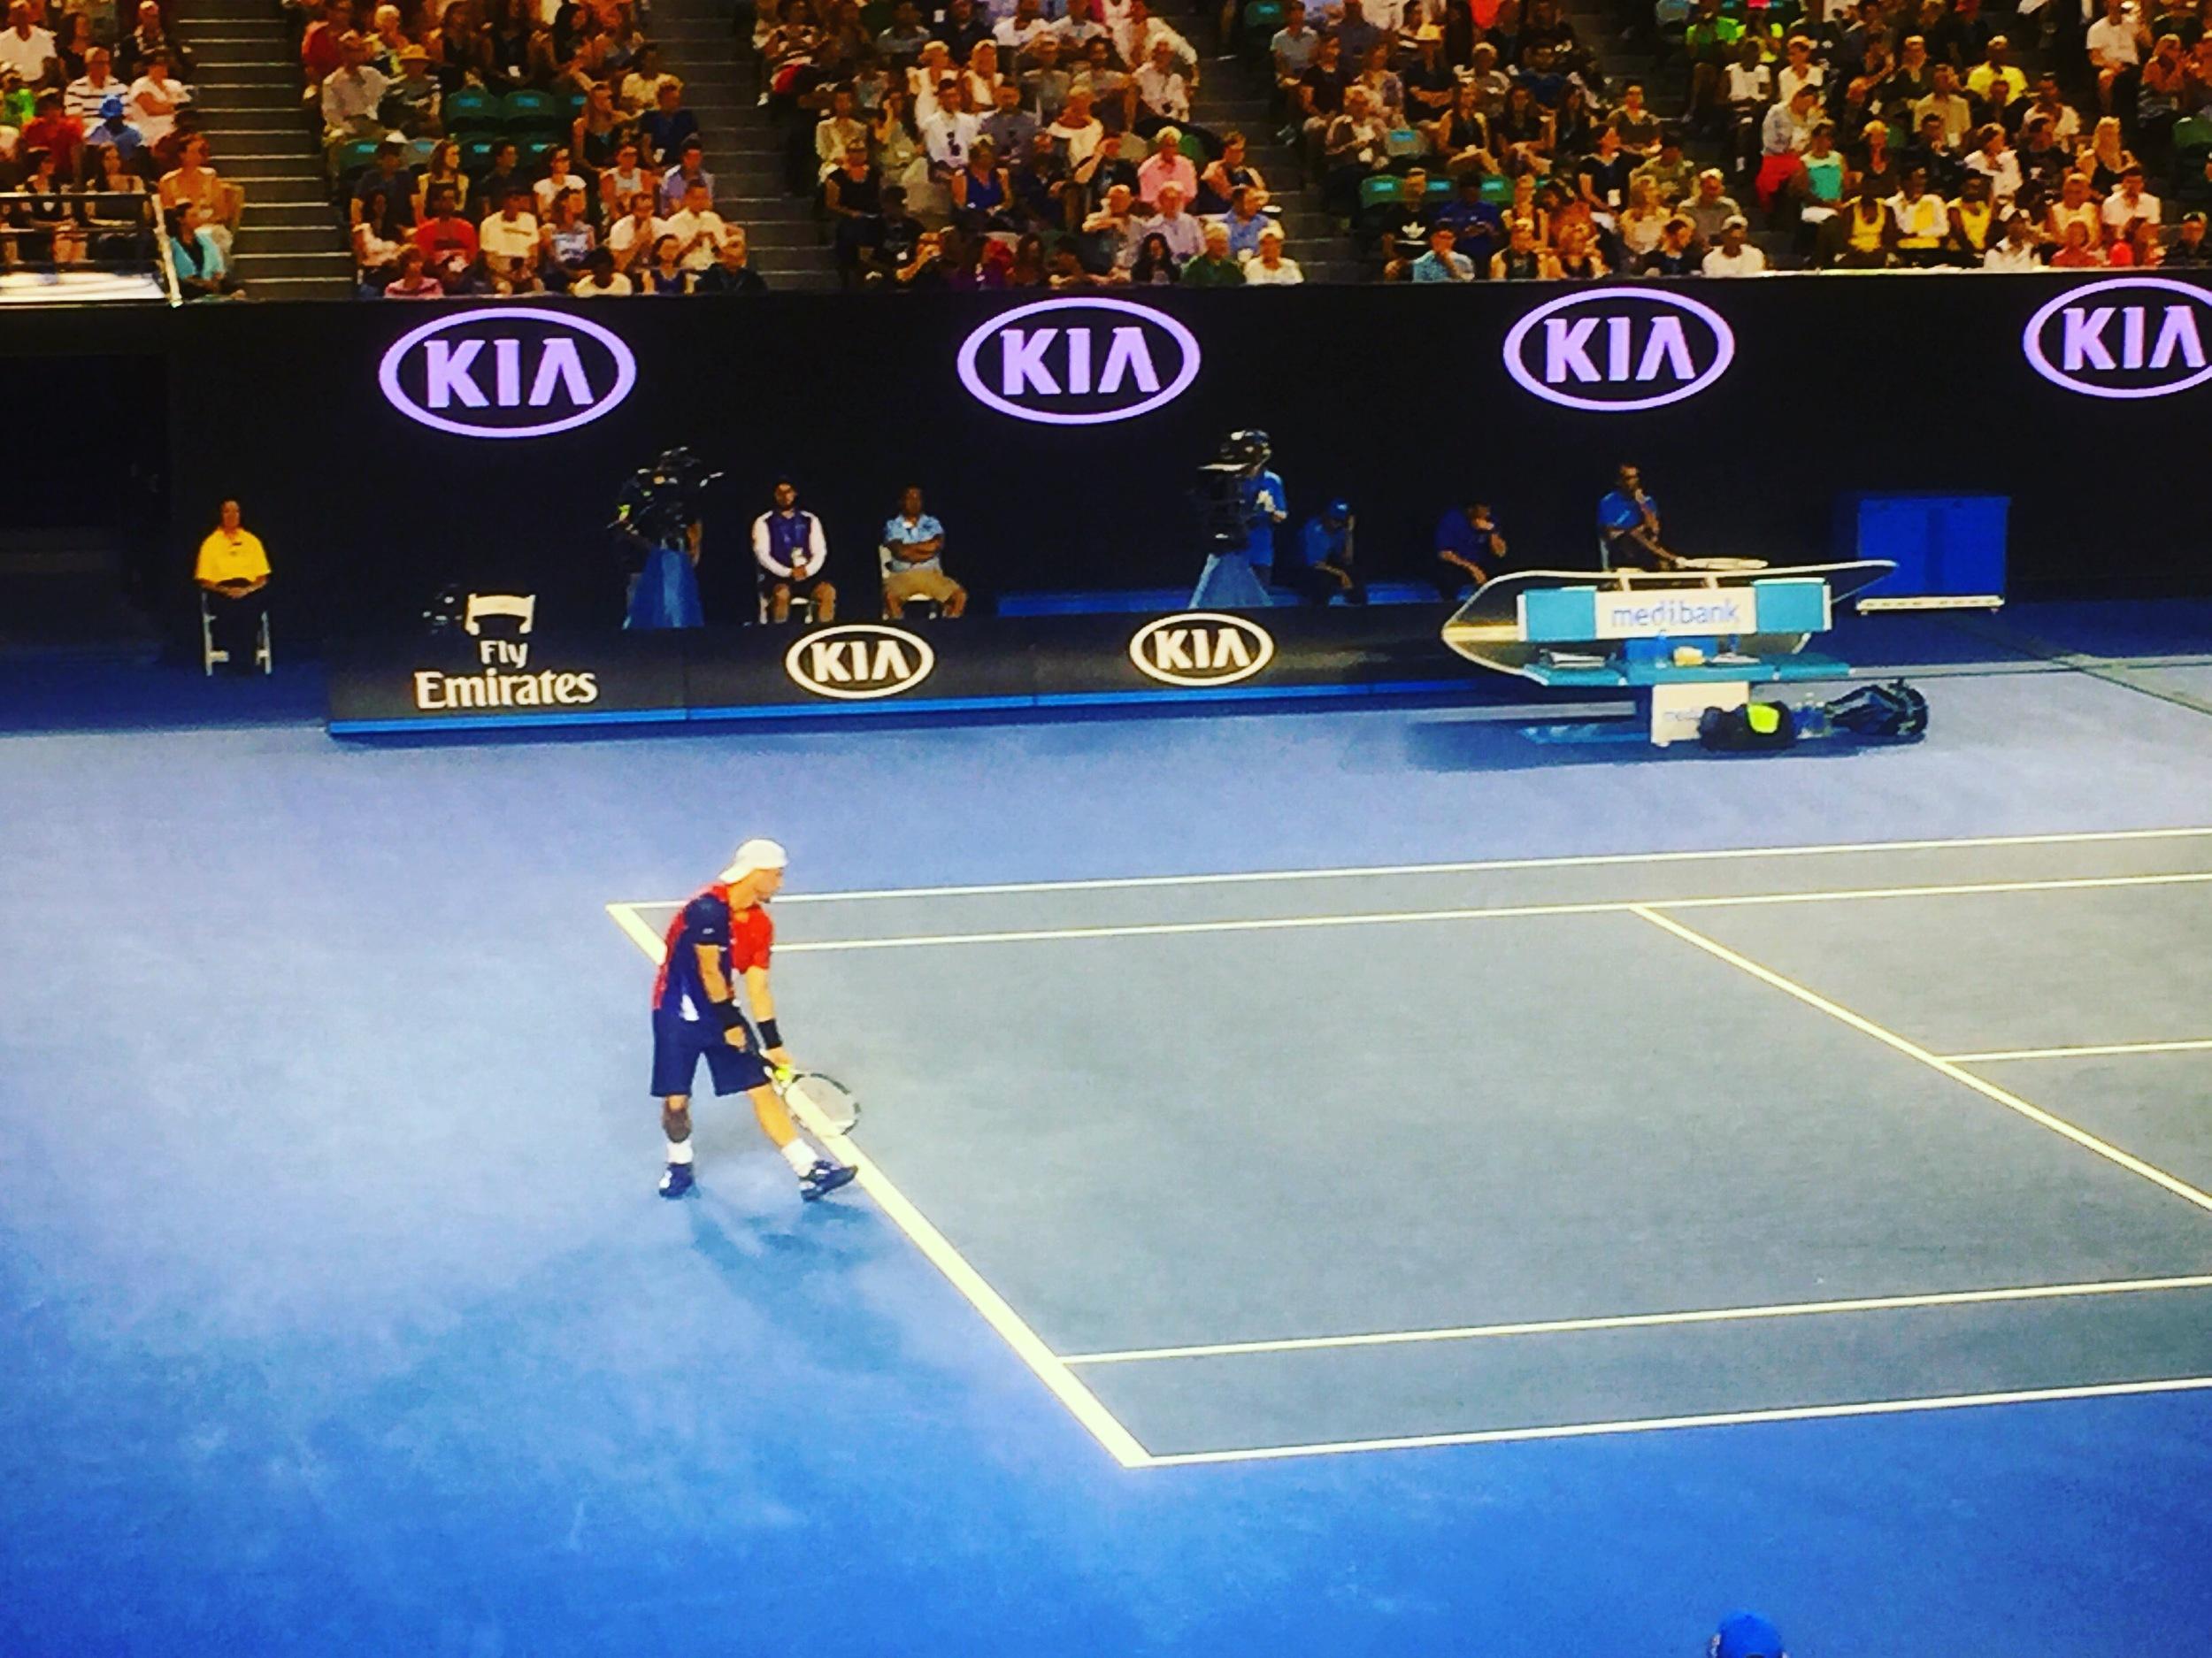 Lleyton Hewitt at the 2016 Australian Open